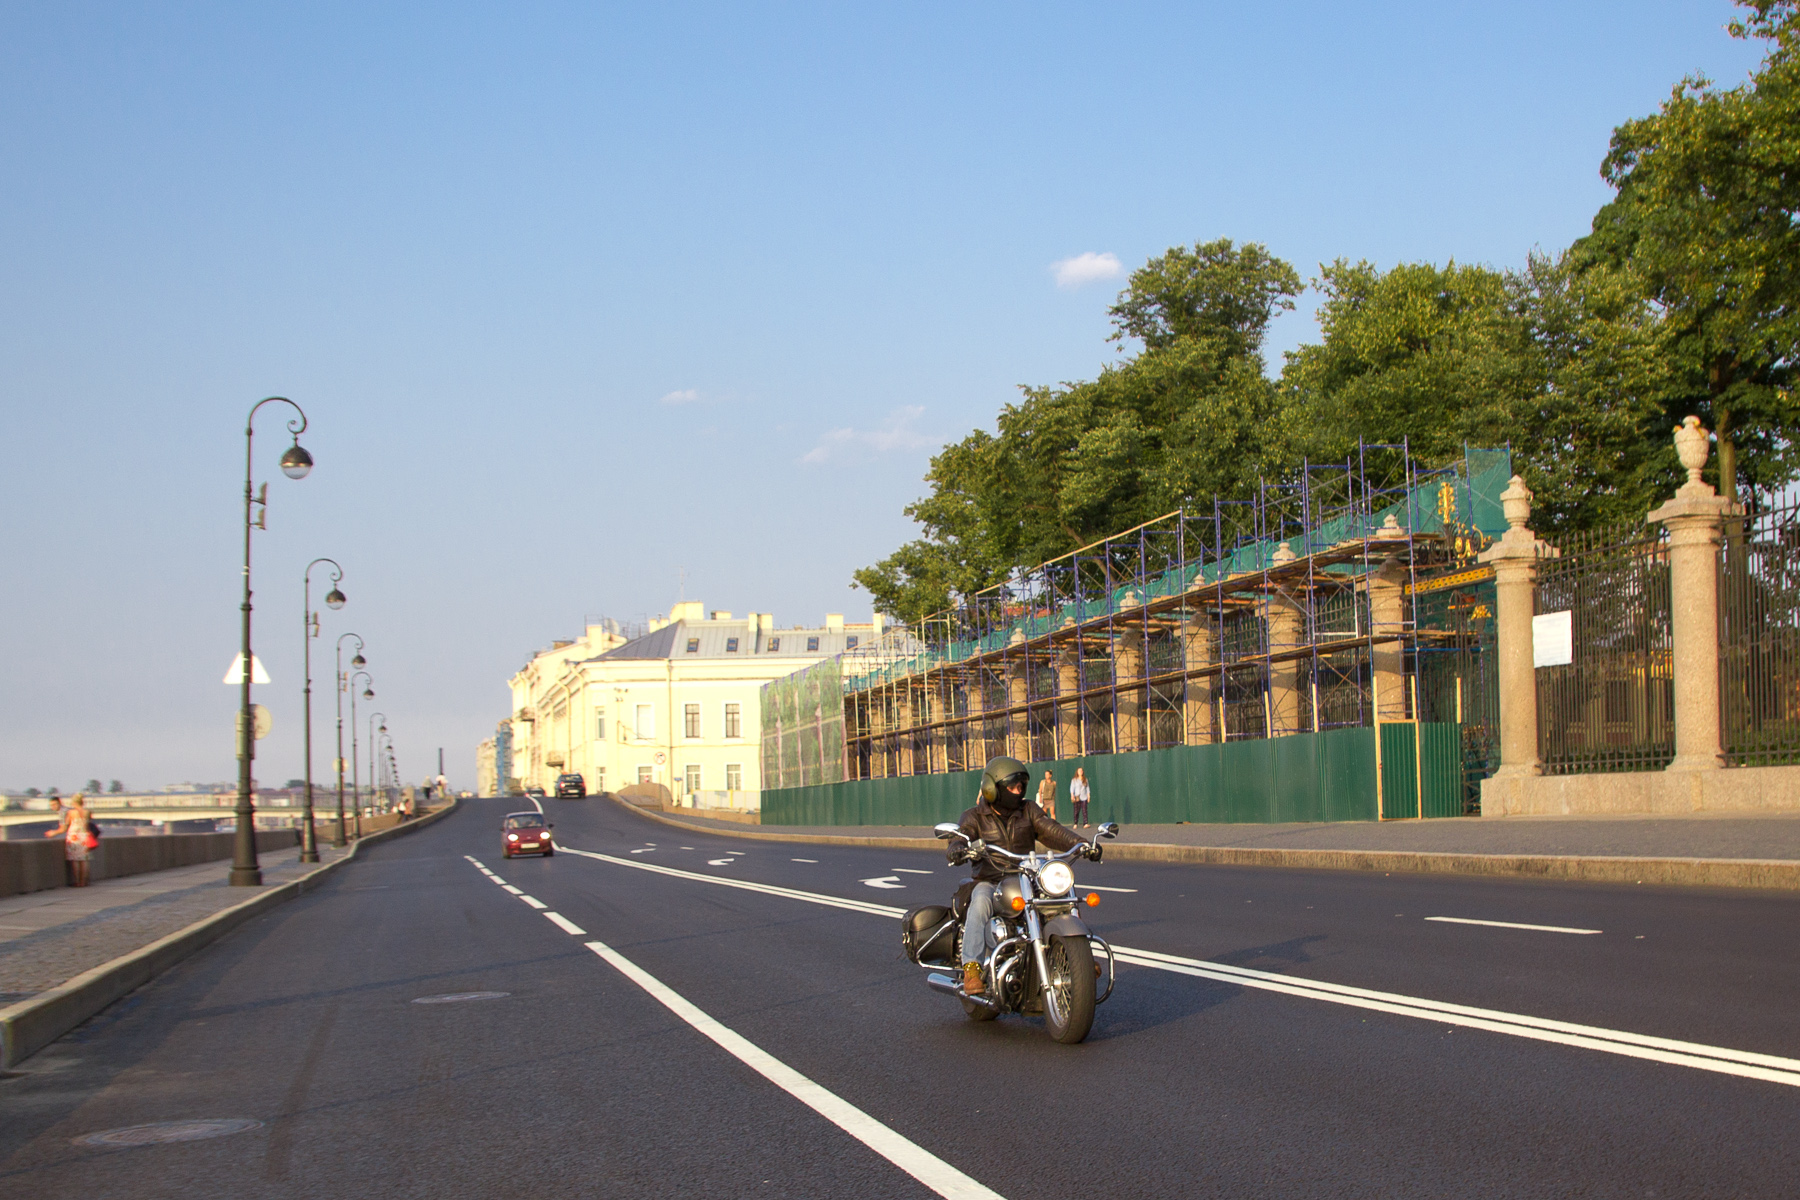 Motorcyclist, Biker, Moto, Motorcycle, Outdoor, HQ Photo